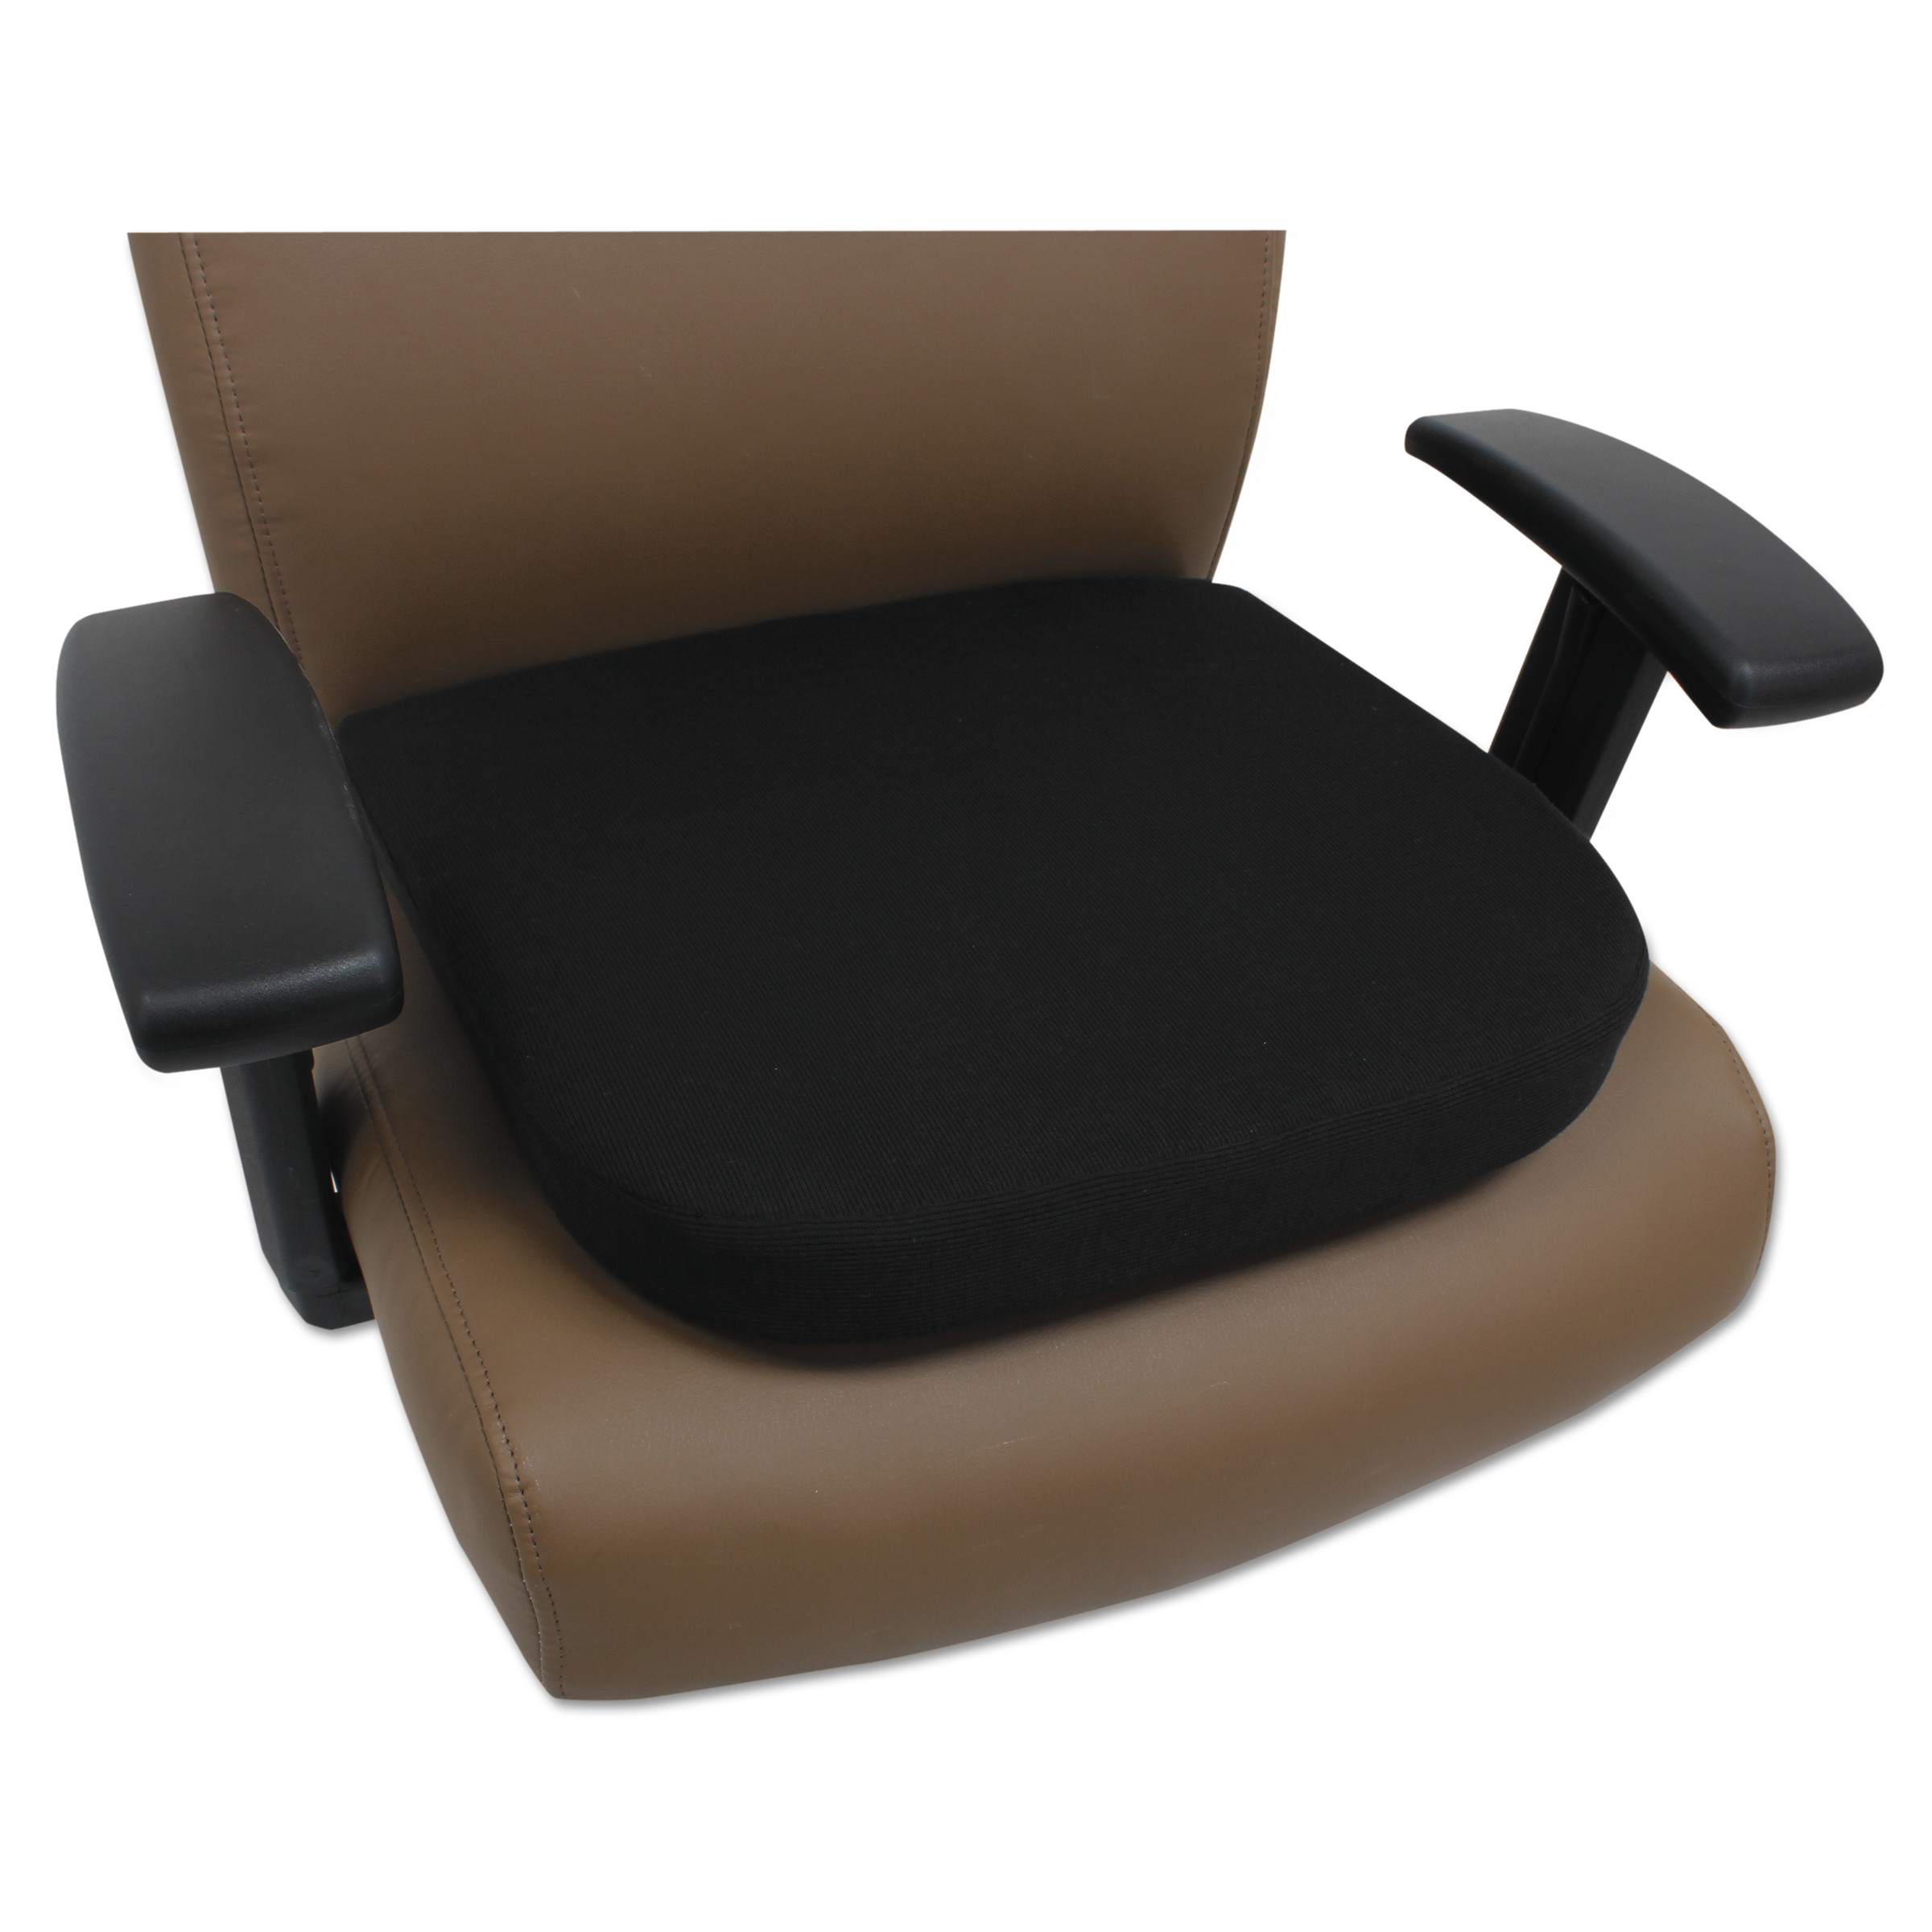 Alera Cooling Gel Memory Foam Seat Cushion, 16 1/2 x 15 3/4 x 2 3/4, Black